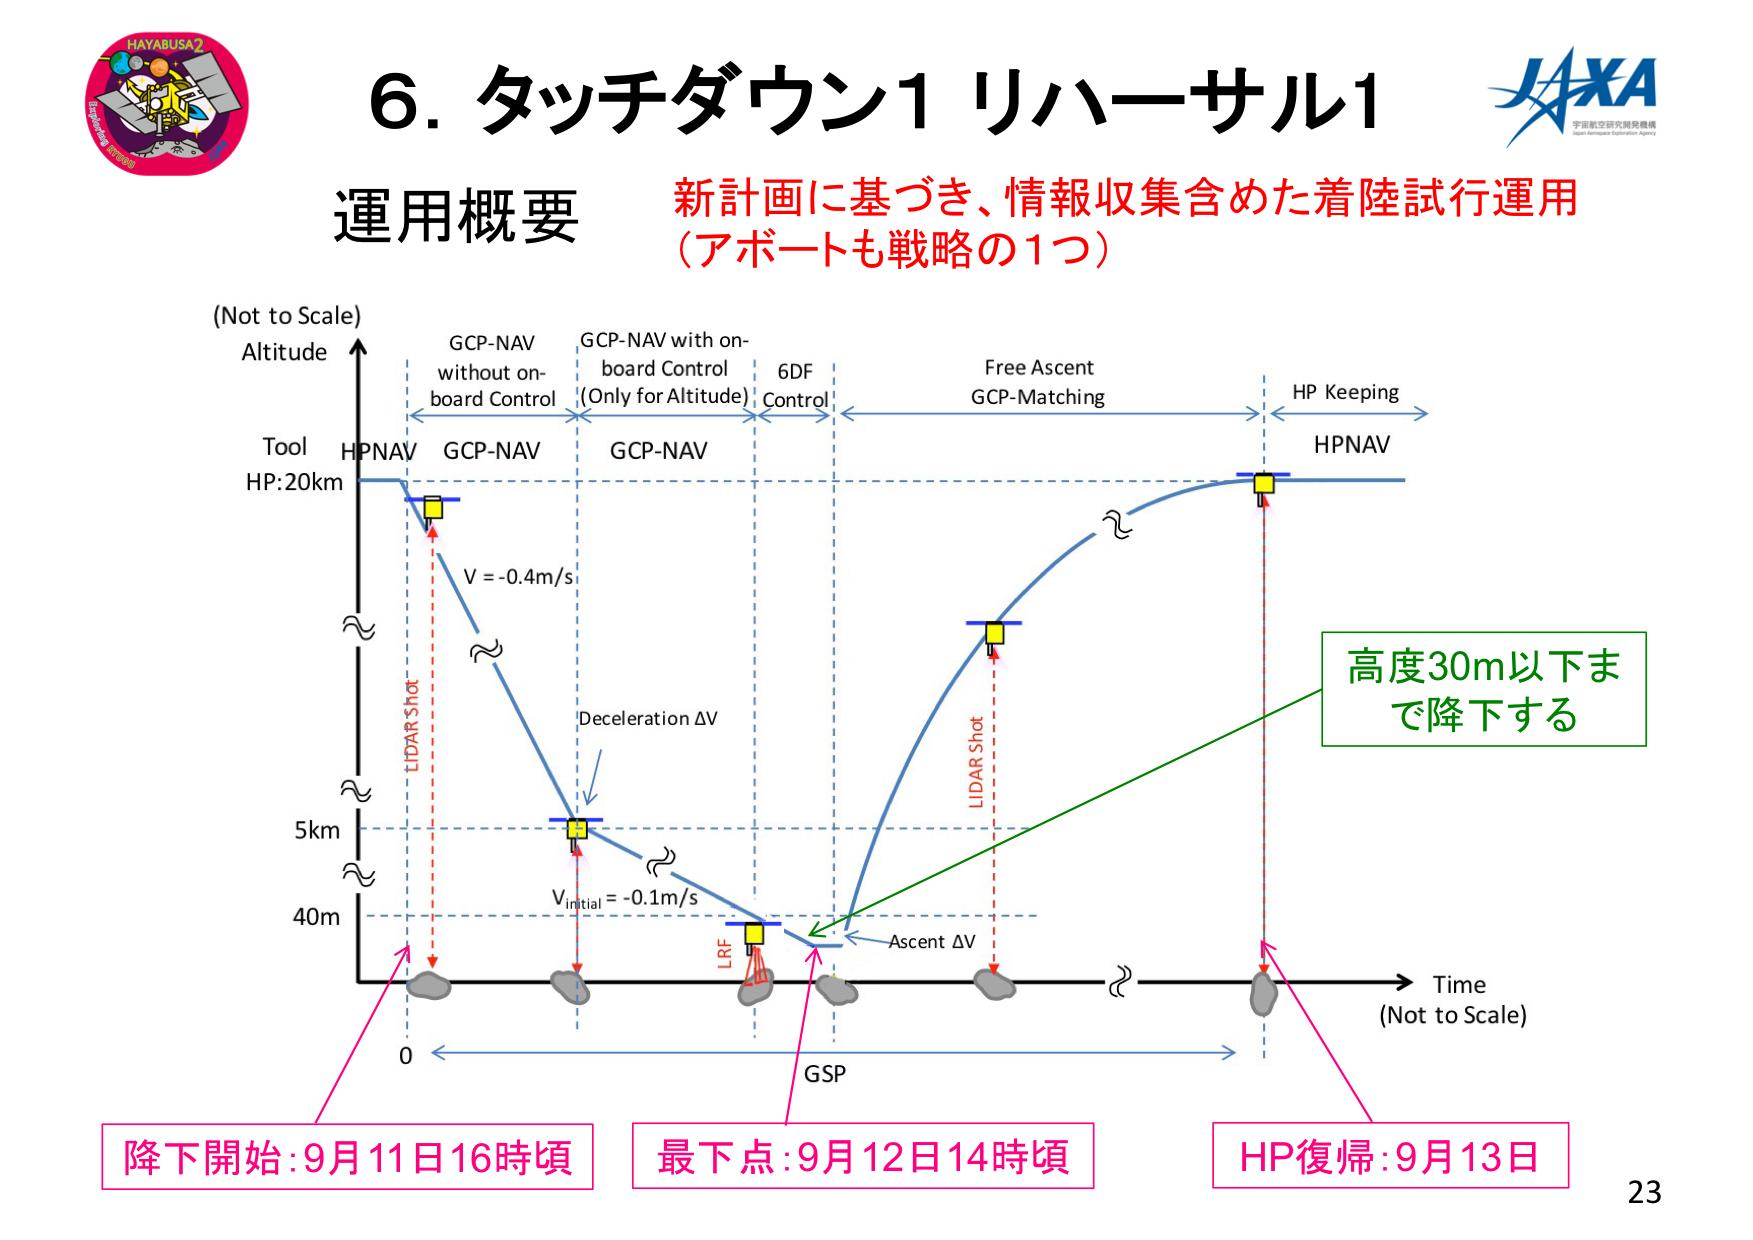 f:id:Imamura:20180905231955p:plain